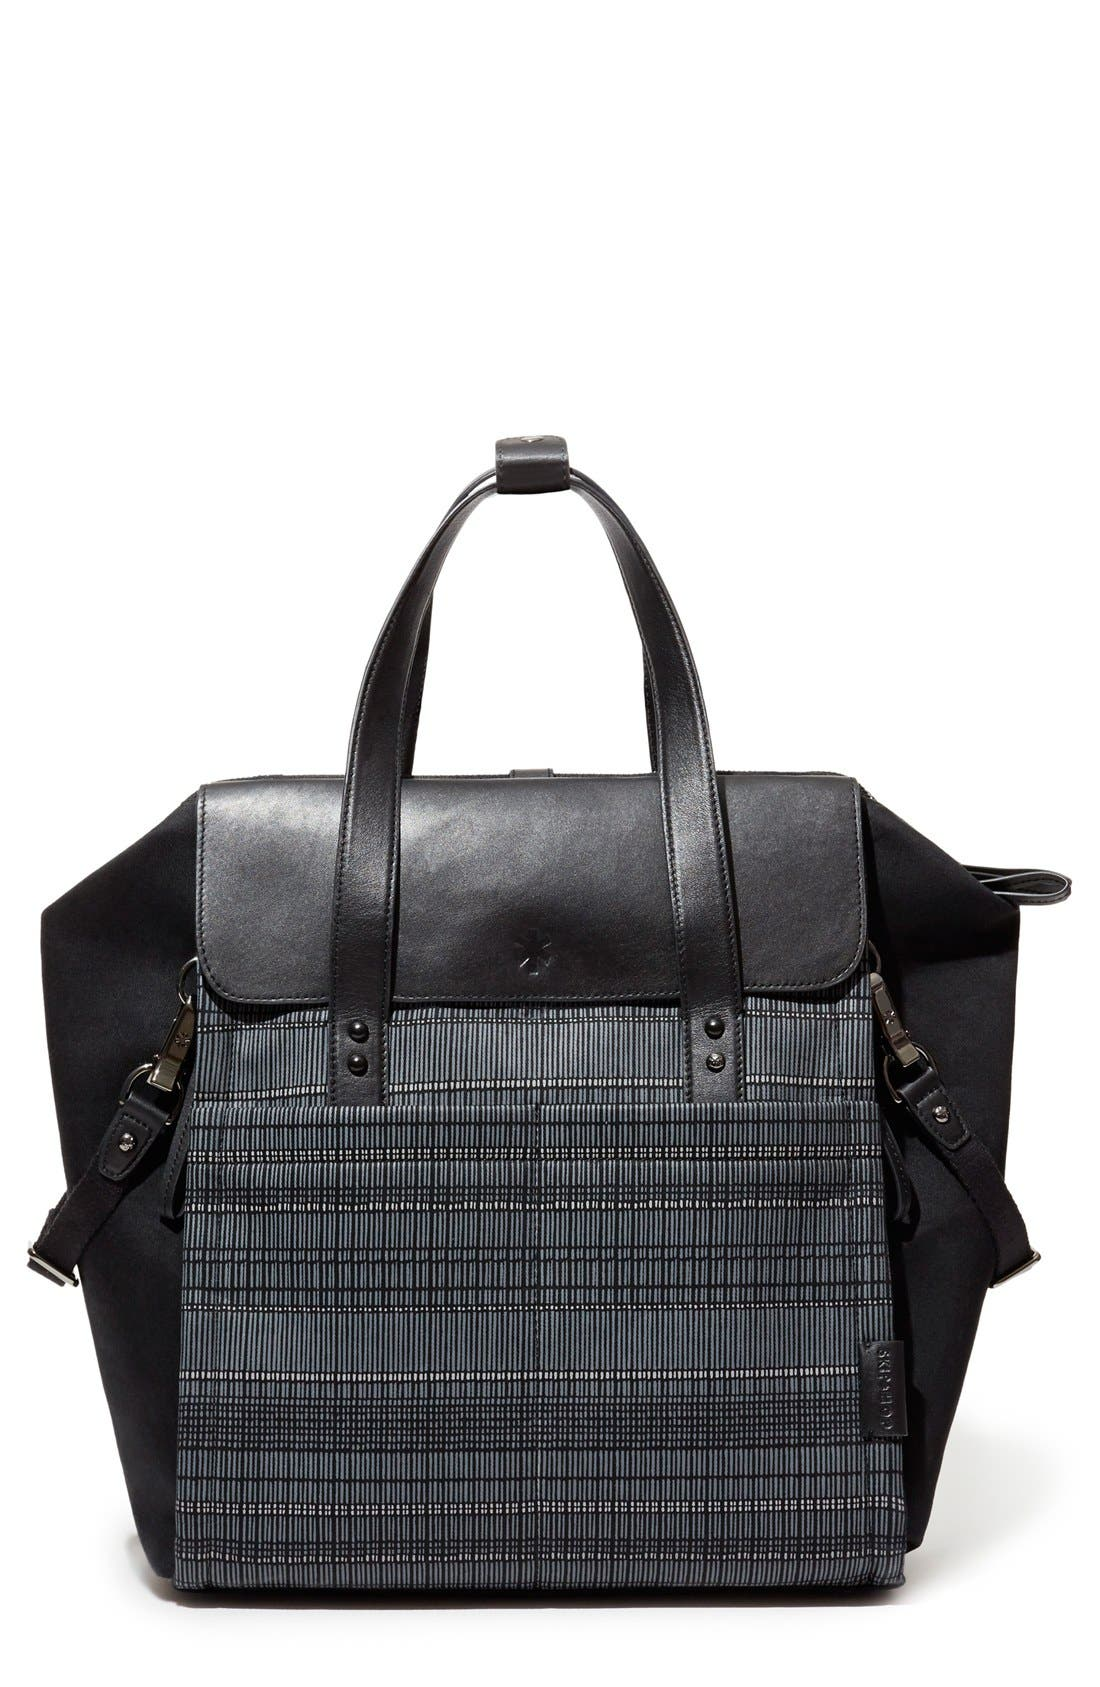 Skip Hop 'Highline' Convertible Diaper Backpack